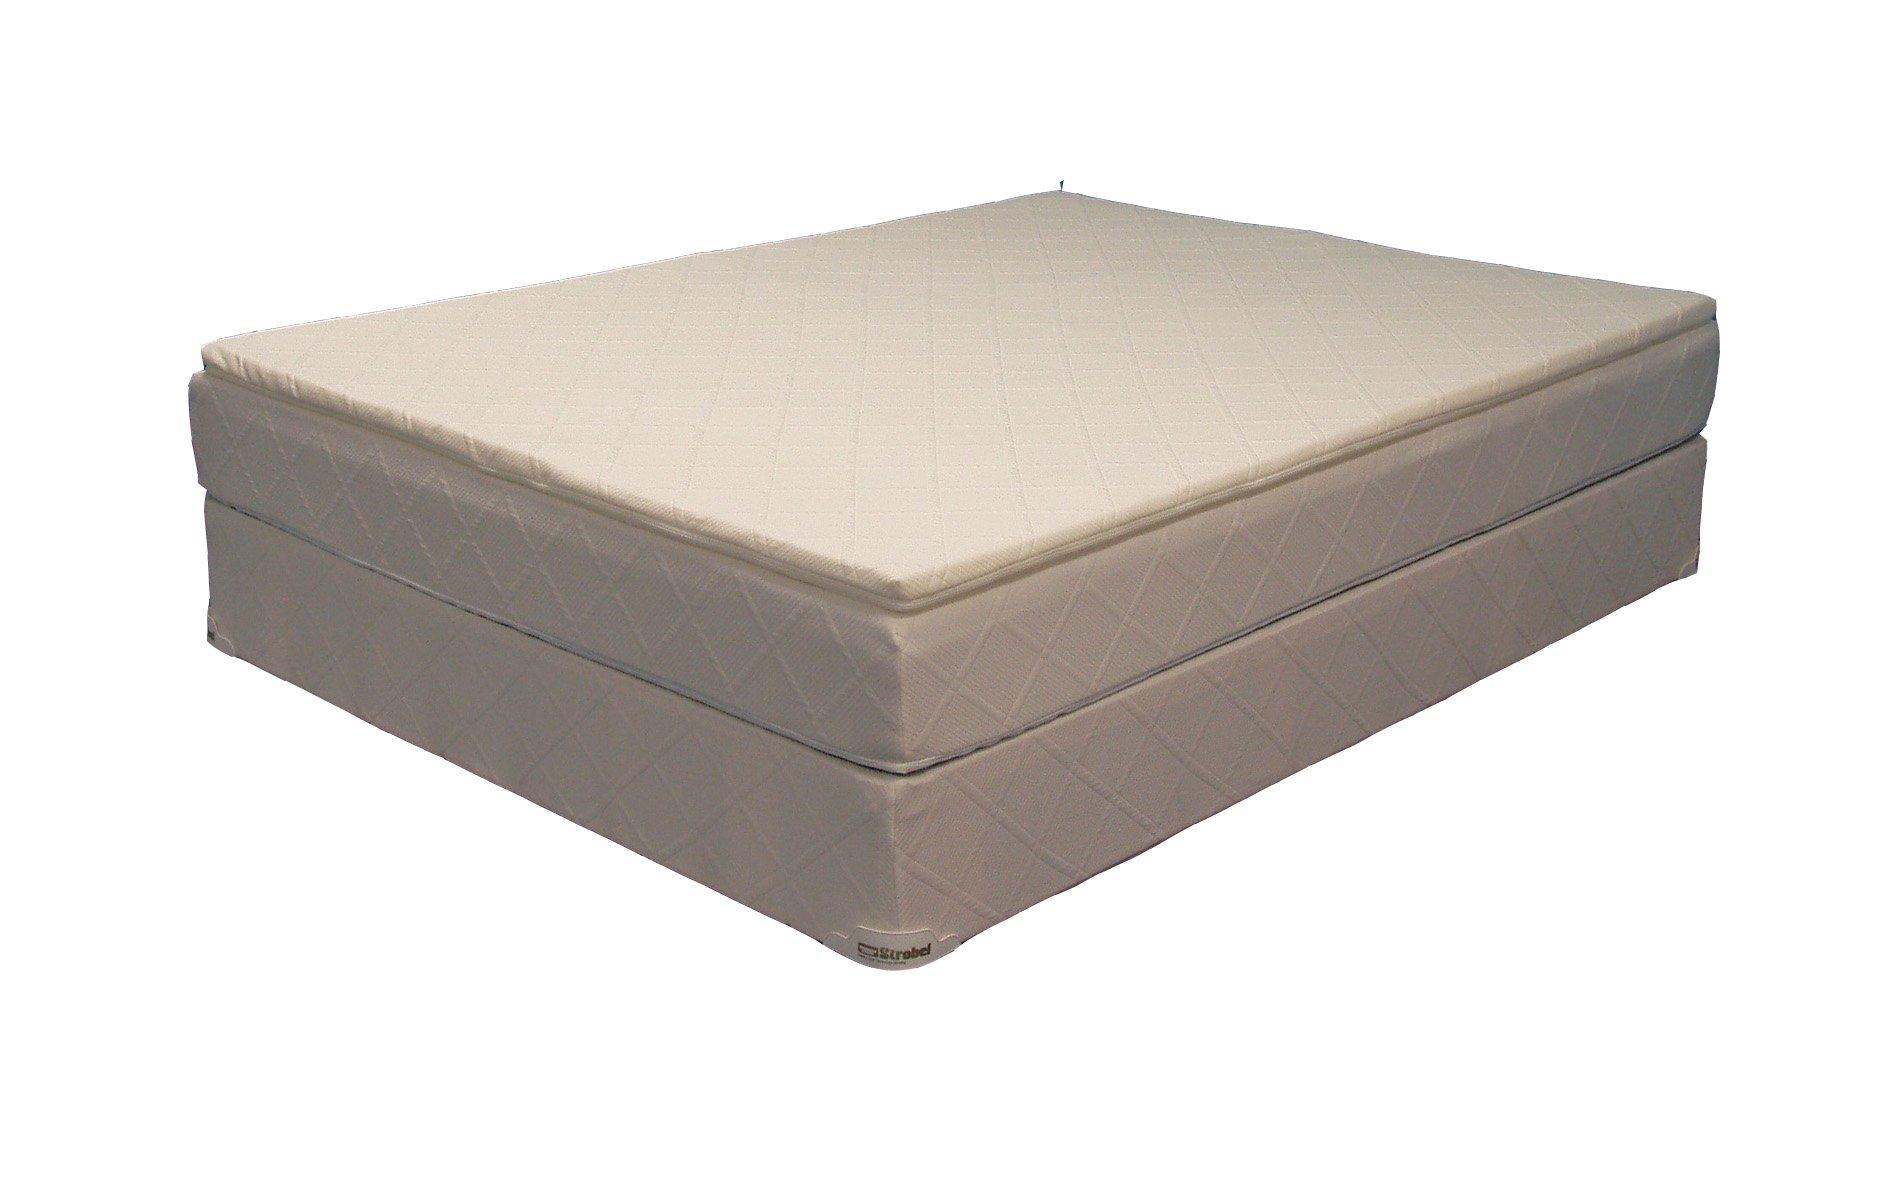 Strobel Organic Complete Softside Waterbed Futura-1-1/2 King Dual by Strobel Organic